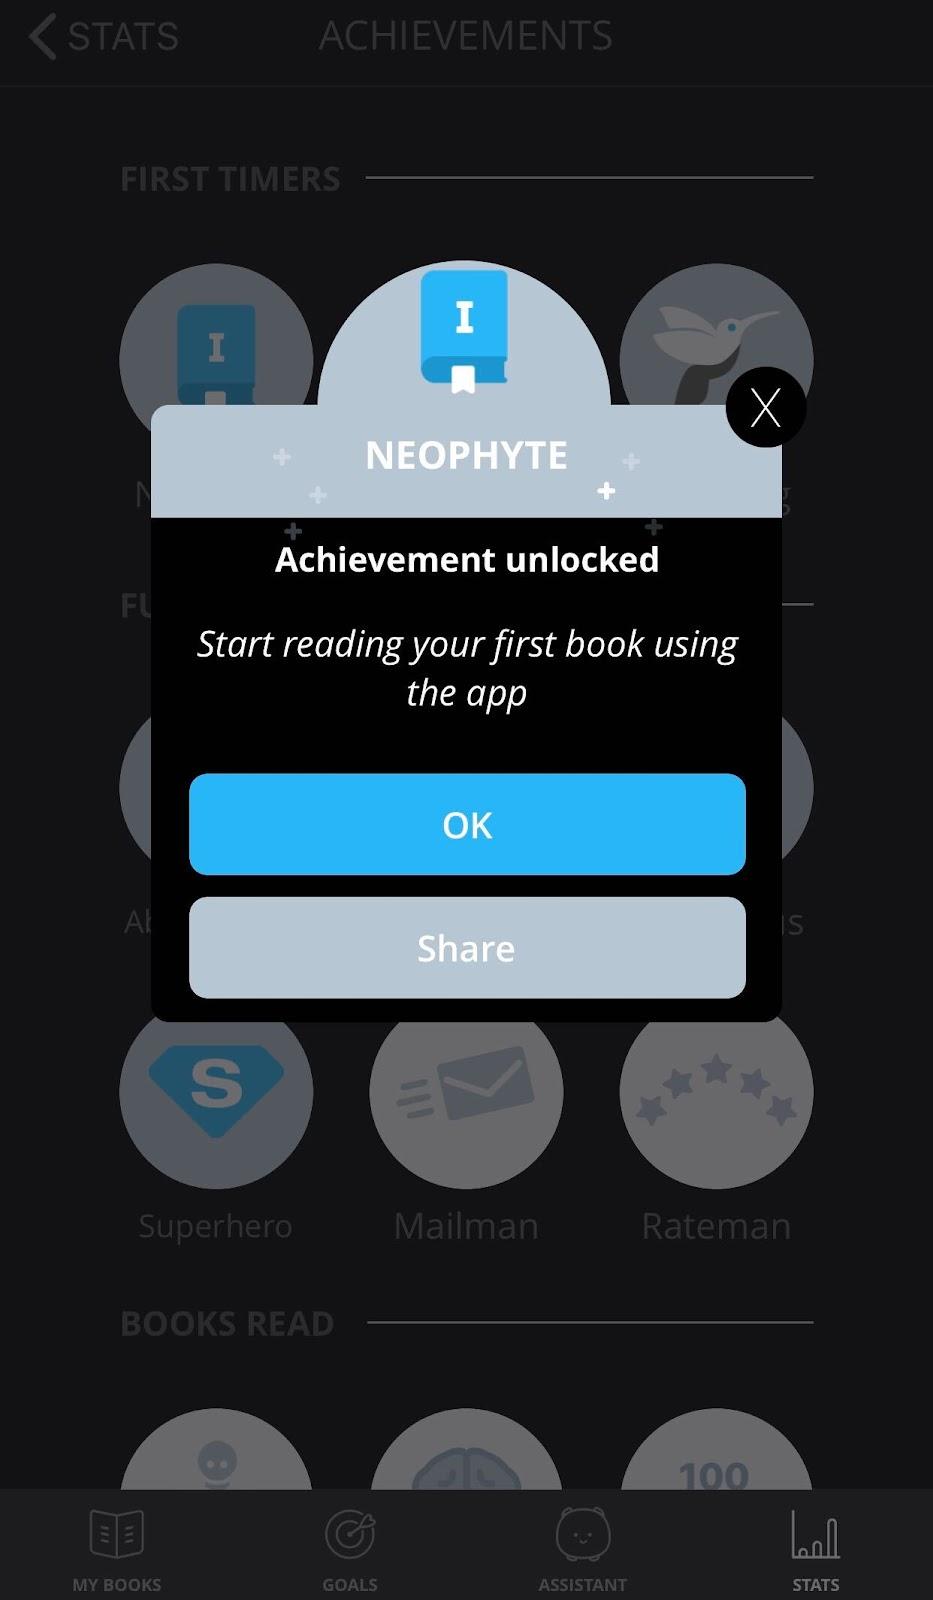 reading-achievements-unlocked